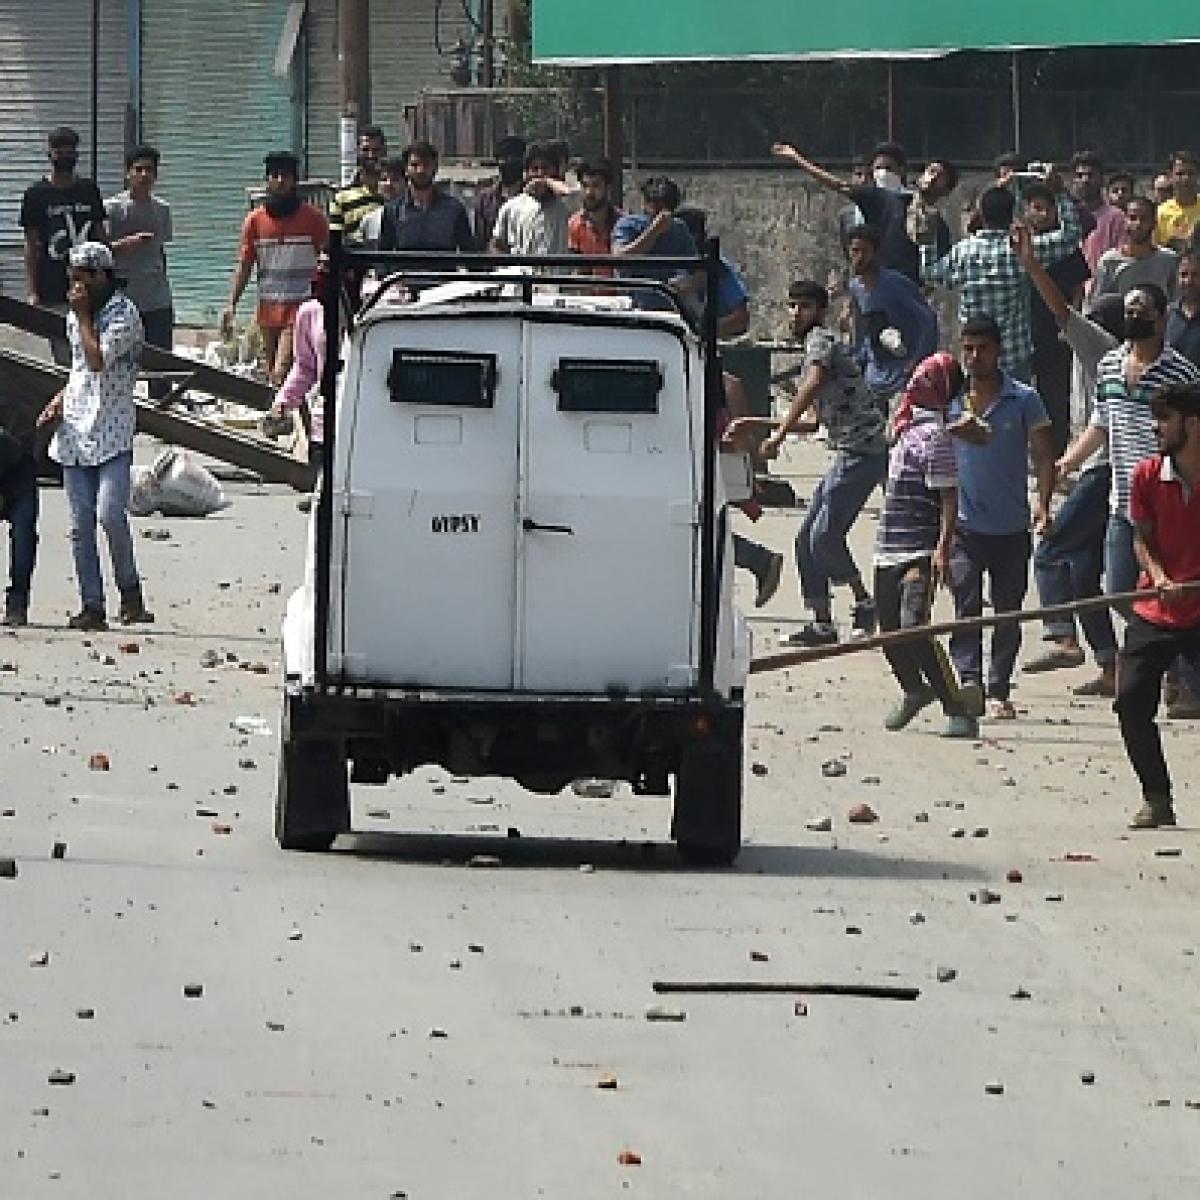 कश्मीर घाटी में पत्थरबाज / फोटो ; Getty Images